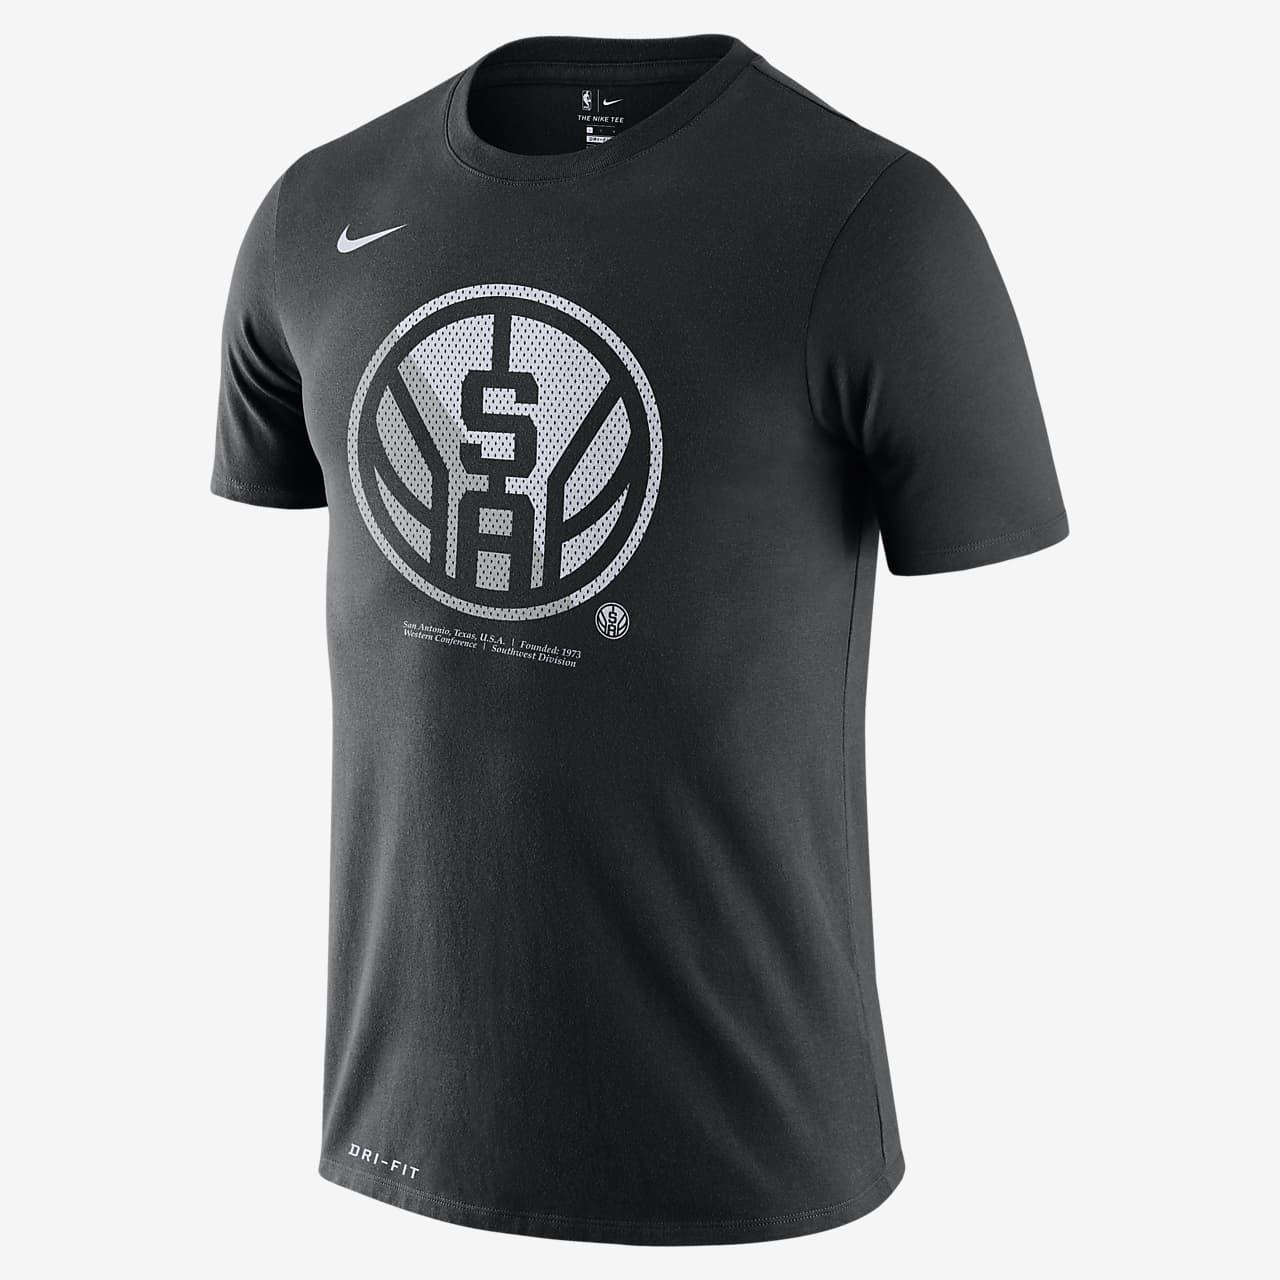 San Antonio Spurs Nike Dri-FIT Men's NBA T-Shirt